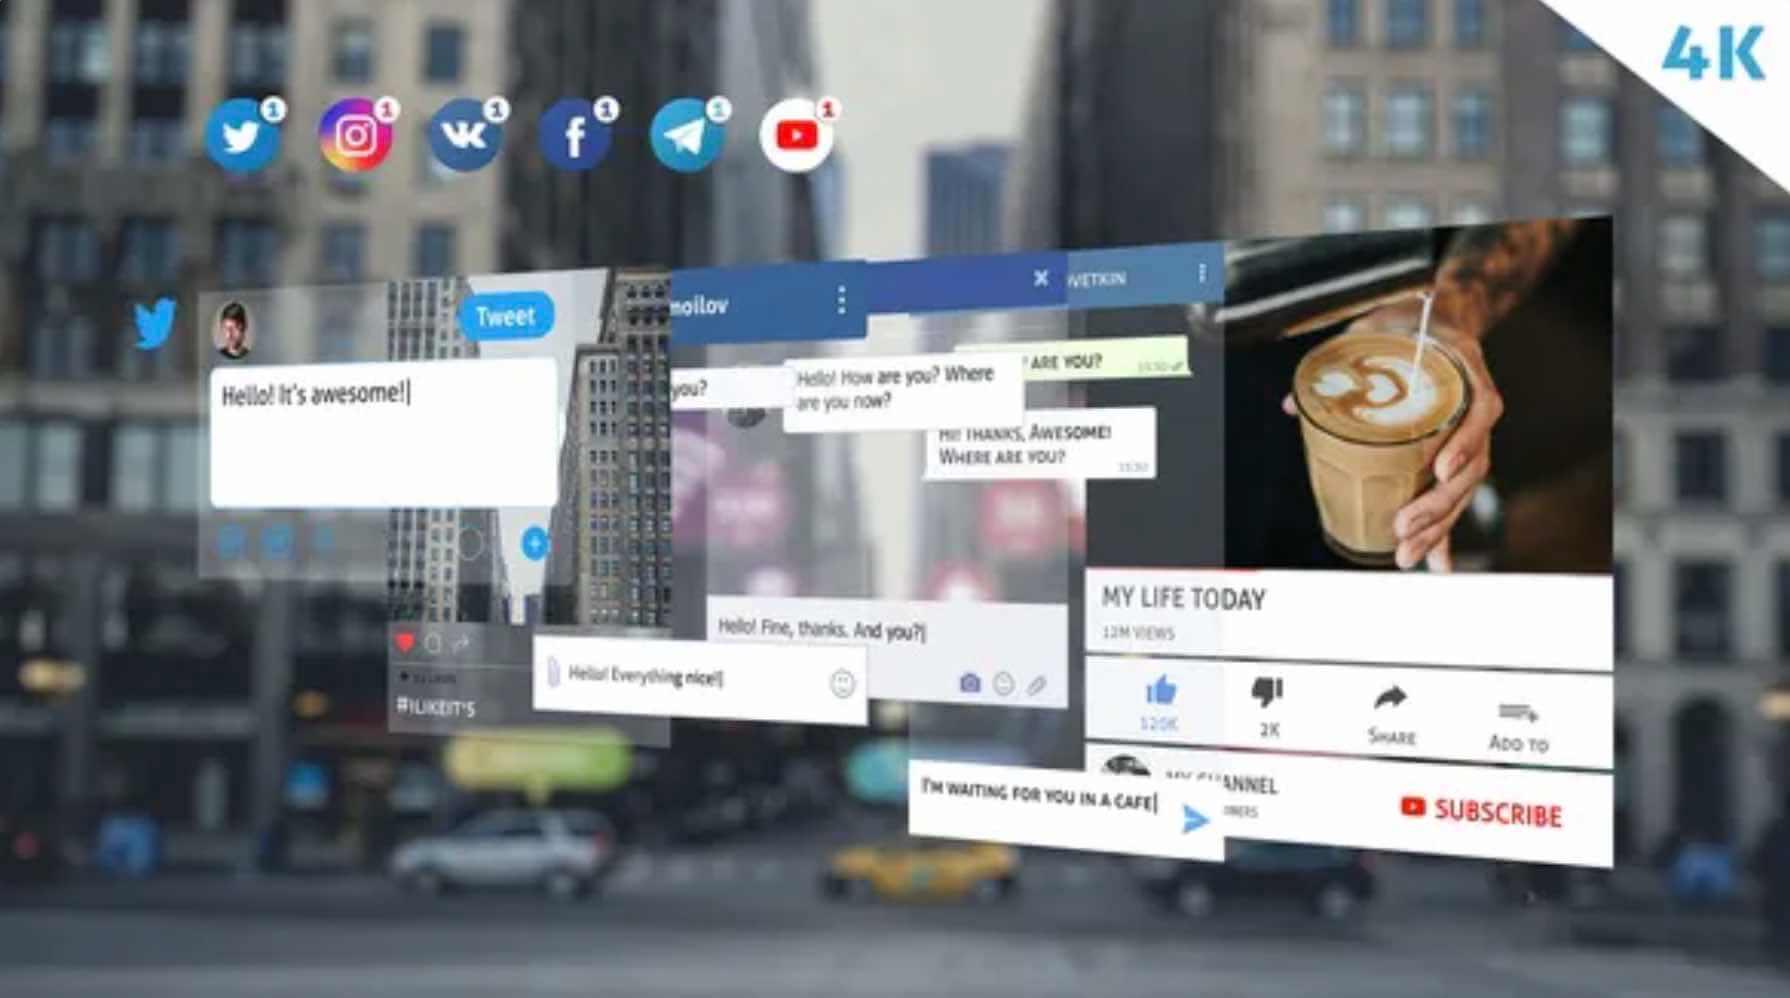 %title插图%num零号CG视觉平台AE模板-4K社交媒体包